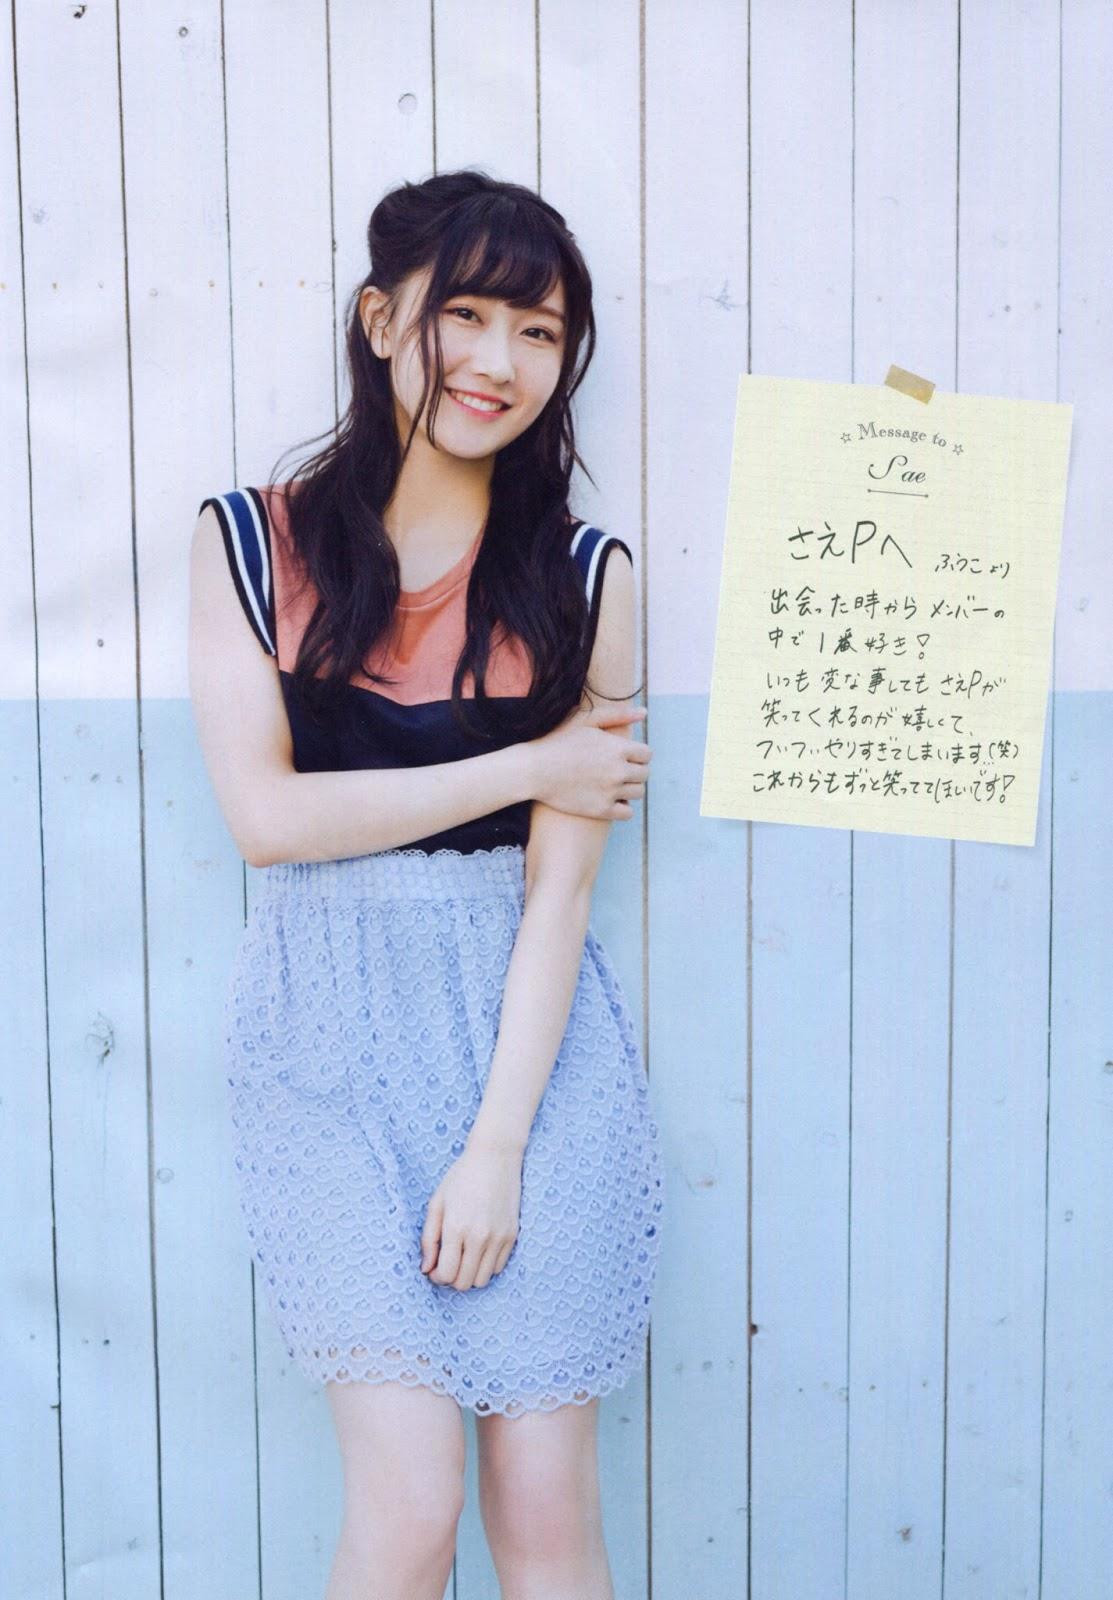 Yagura Fuuko 矢倉楓子, Murase Sae 村瀬紗英, FLASHスペシャルグラビアBEST 2018新春号